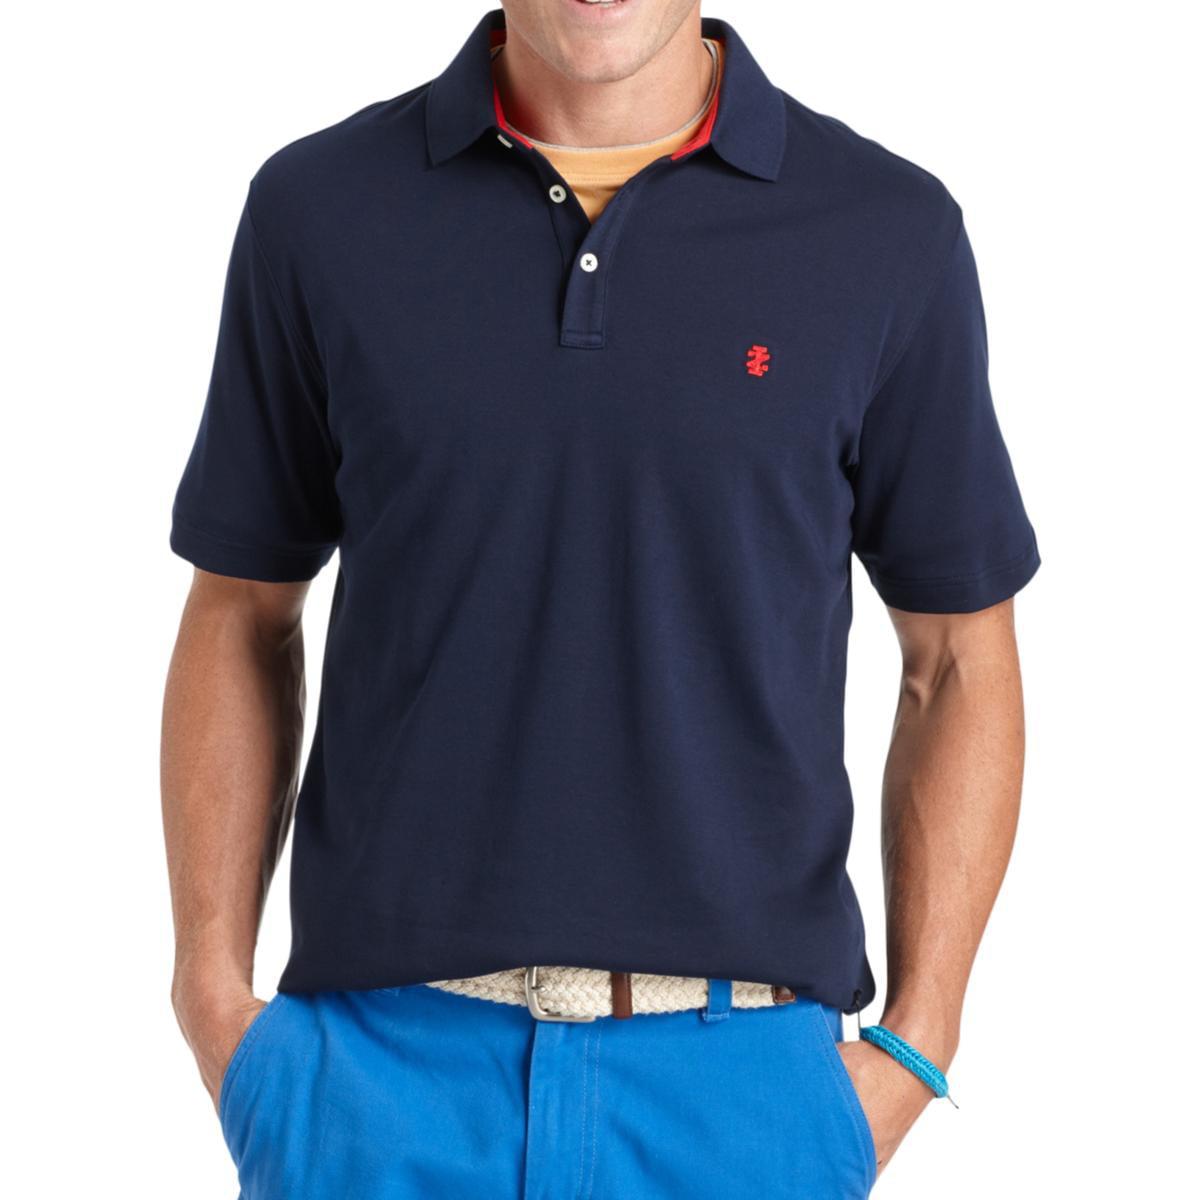 Izod Mens Monogram UPF-15 UV Polo Shirt